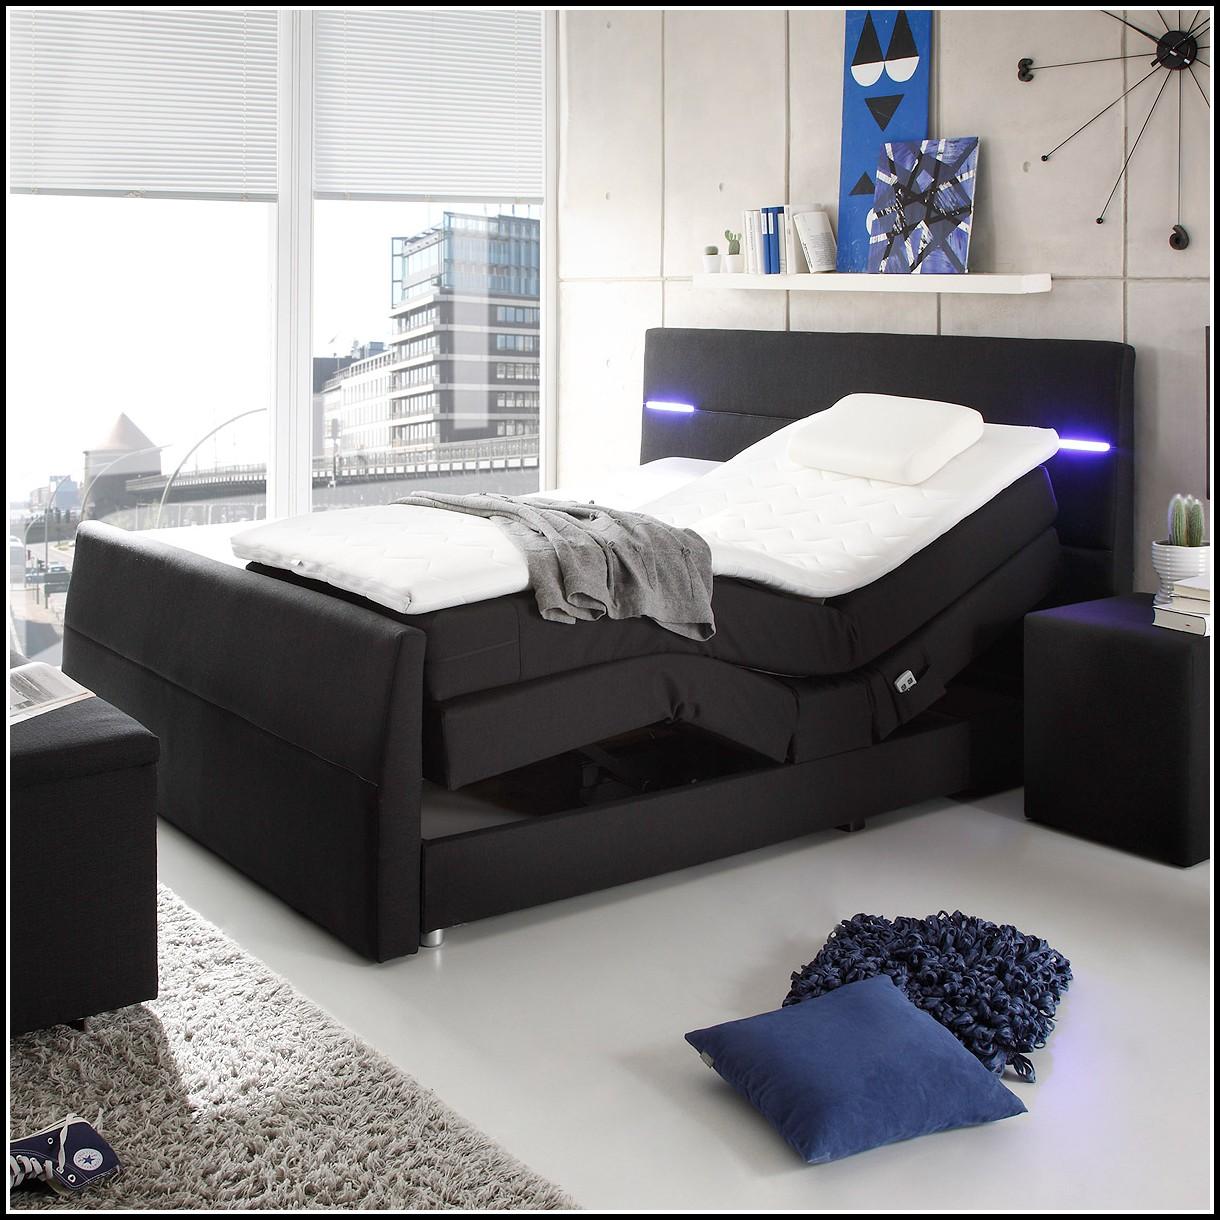 boxspring bett 1 20x2 00 betten house und dekor. Black Bedroom Furniture Sets. Home Design Ideas